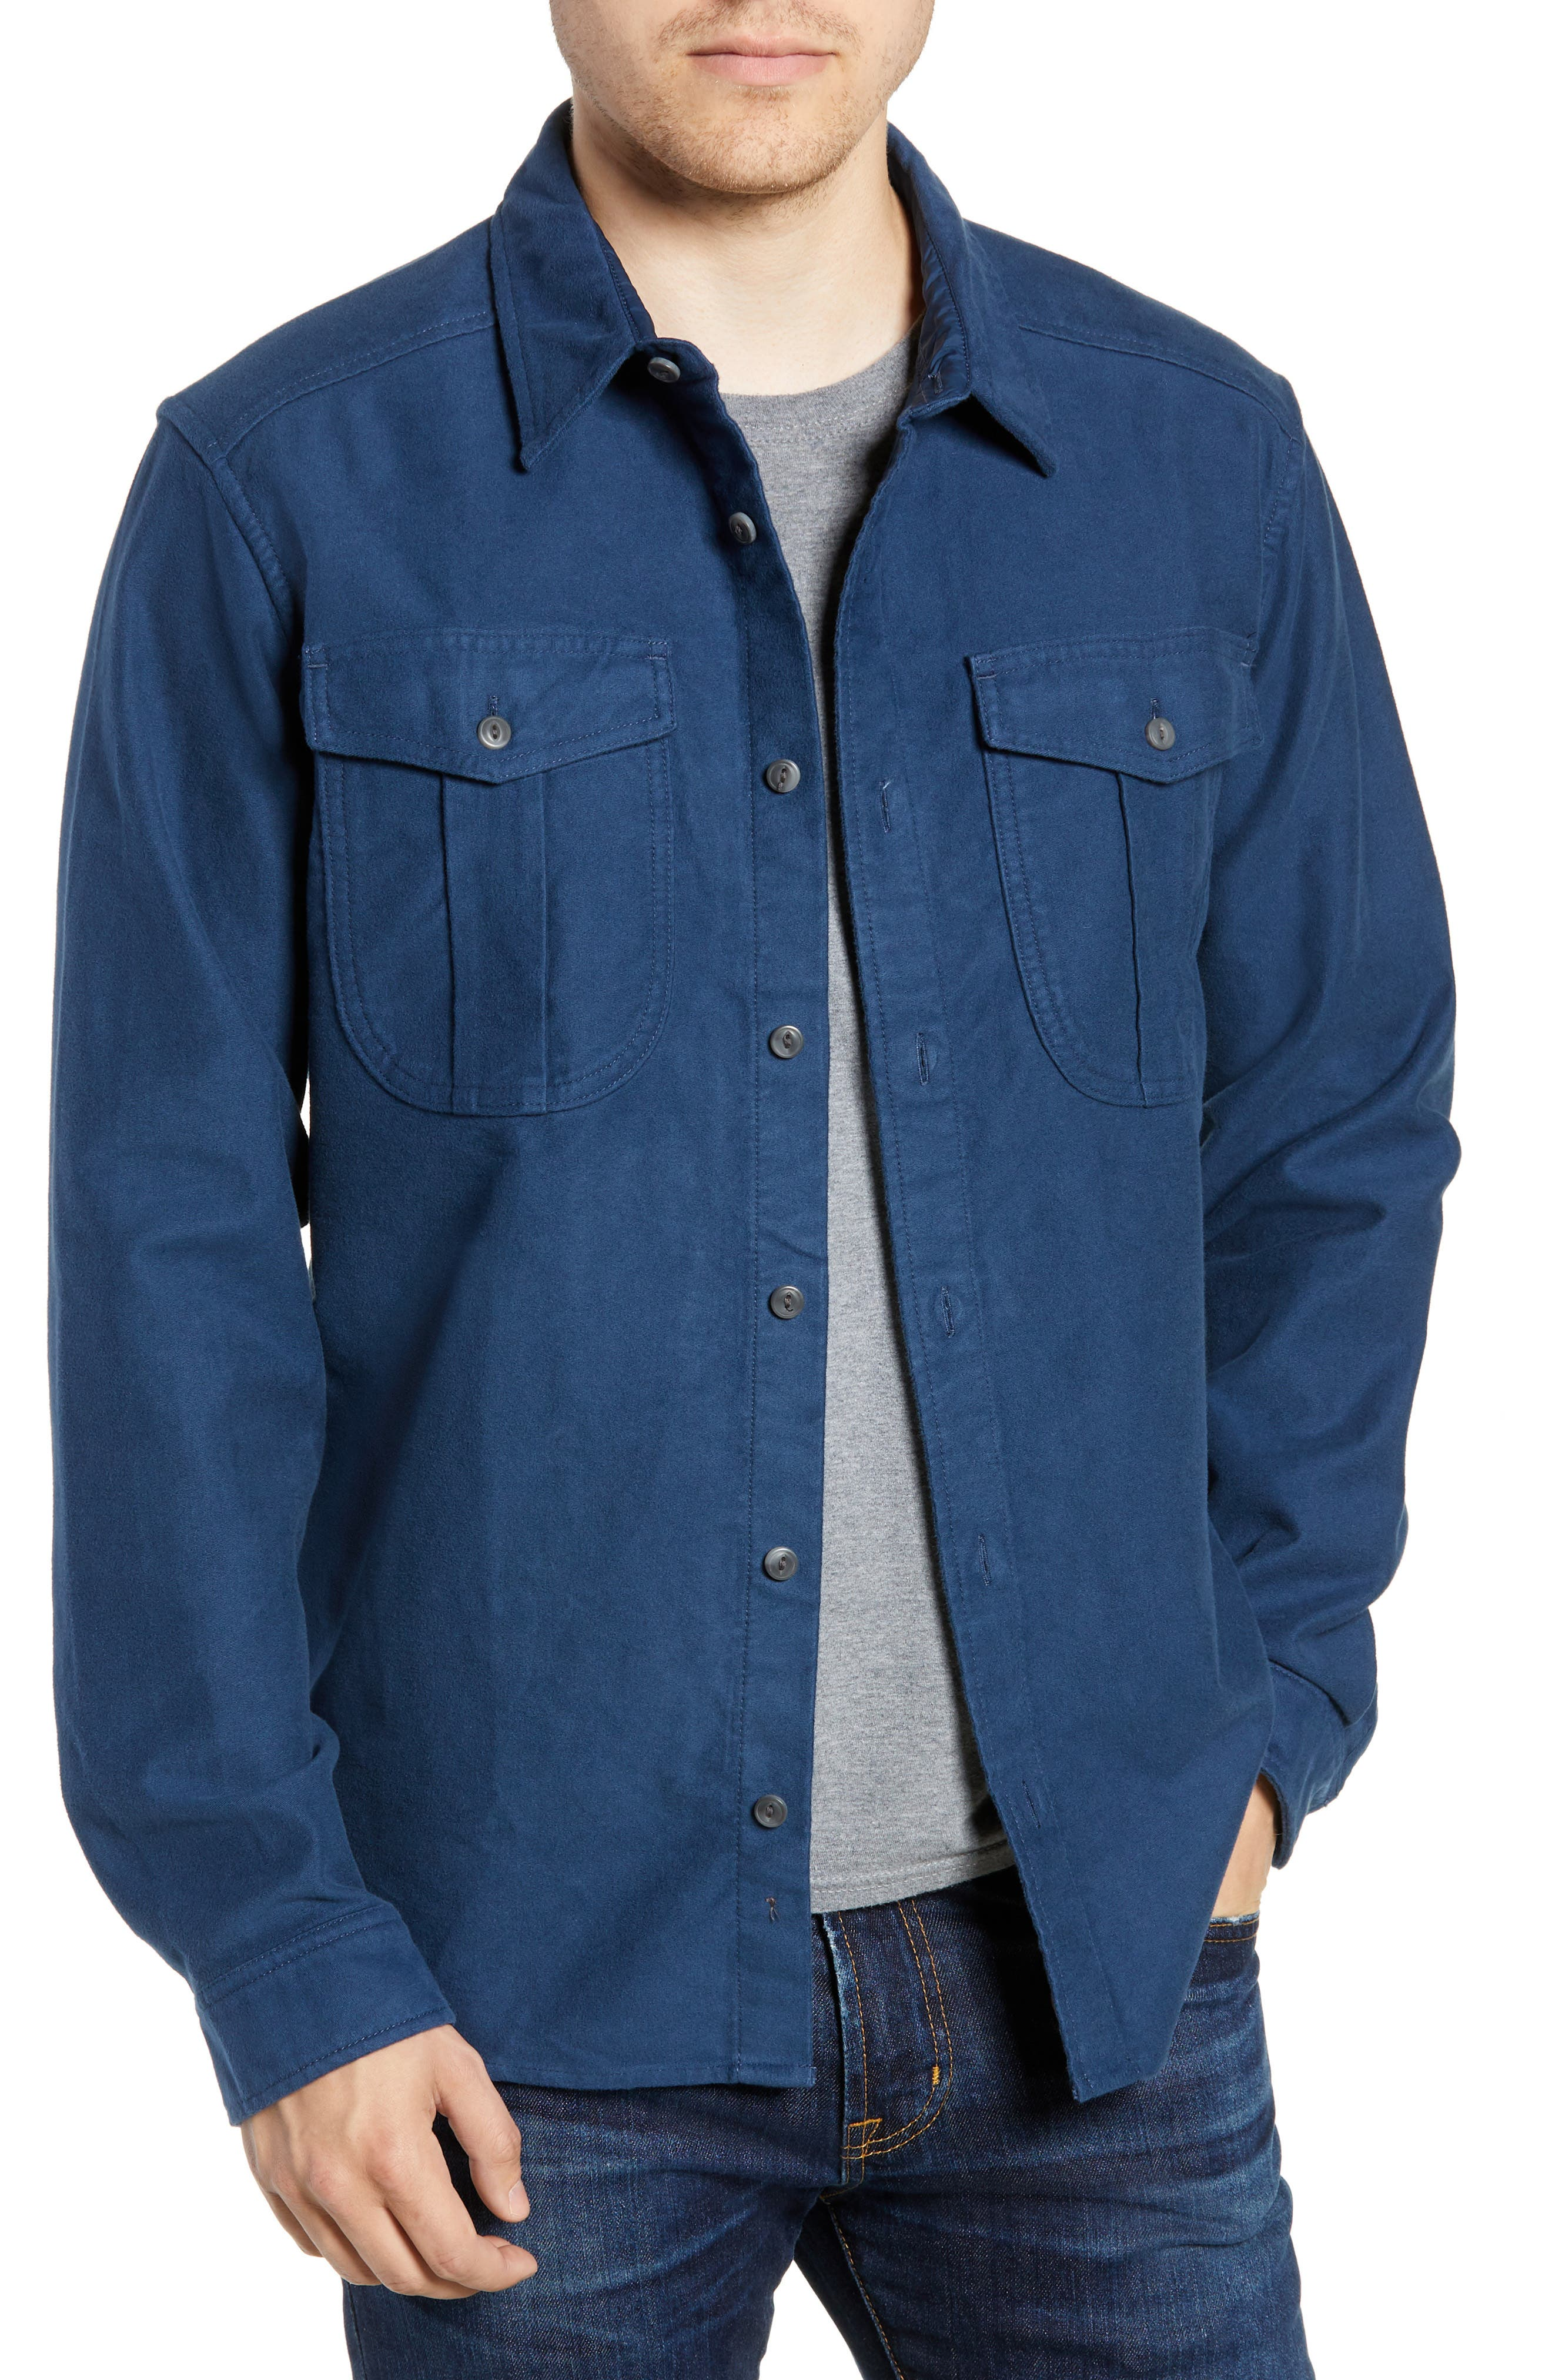 PATAGONIA Topo Canyon Moleskin Shirt in Stone Blue